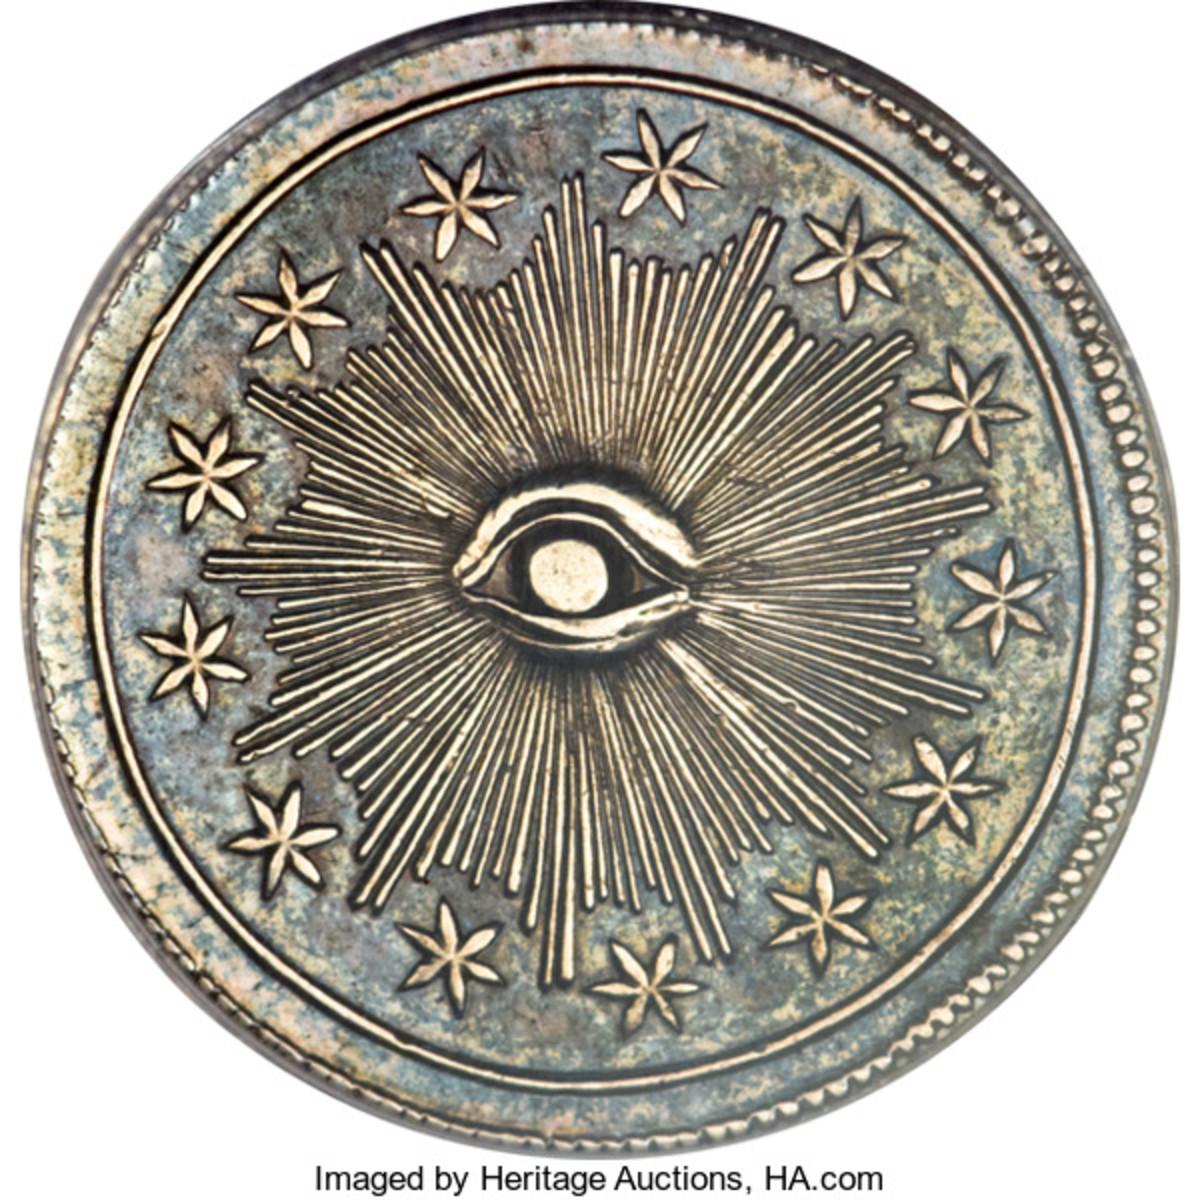 Australian 18th century quint coin